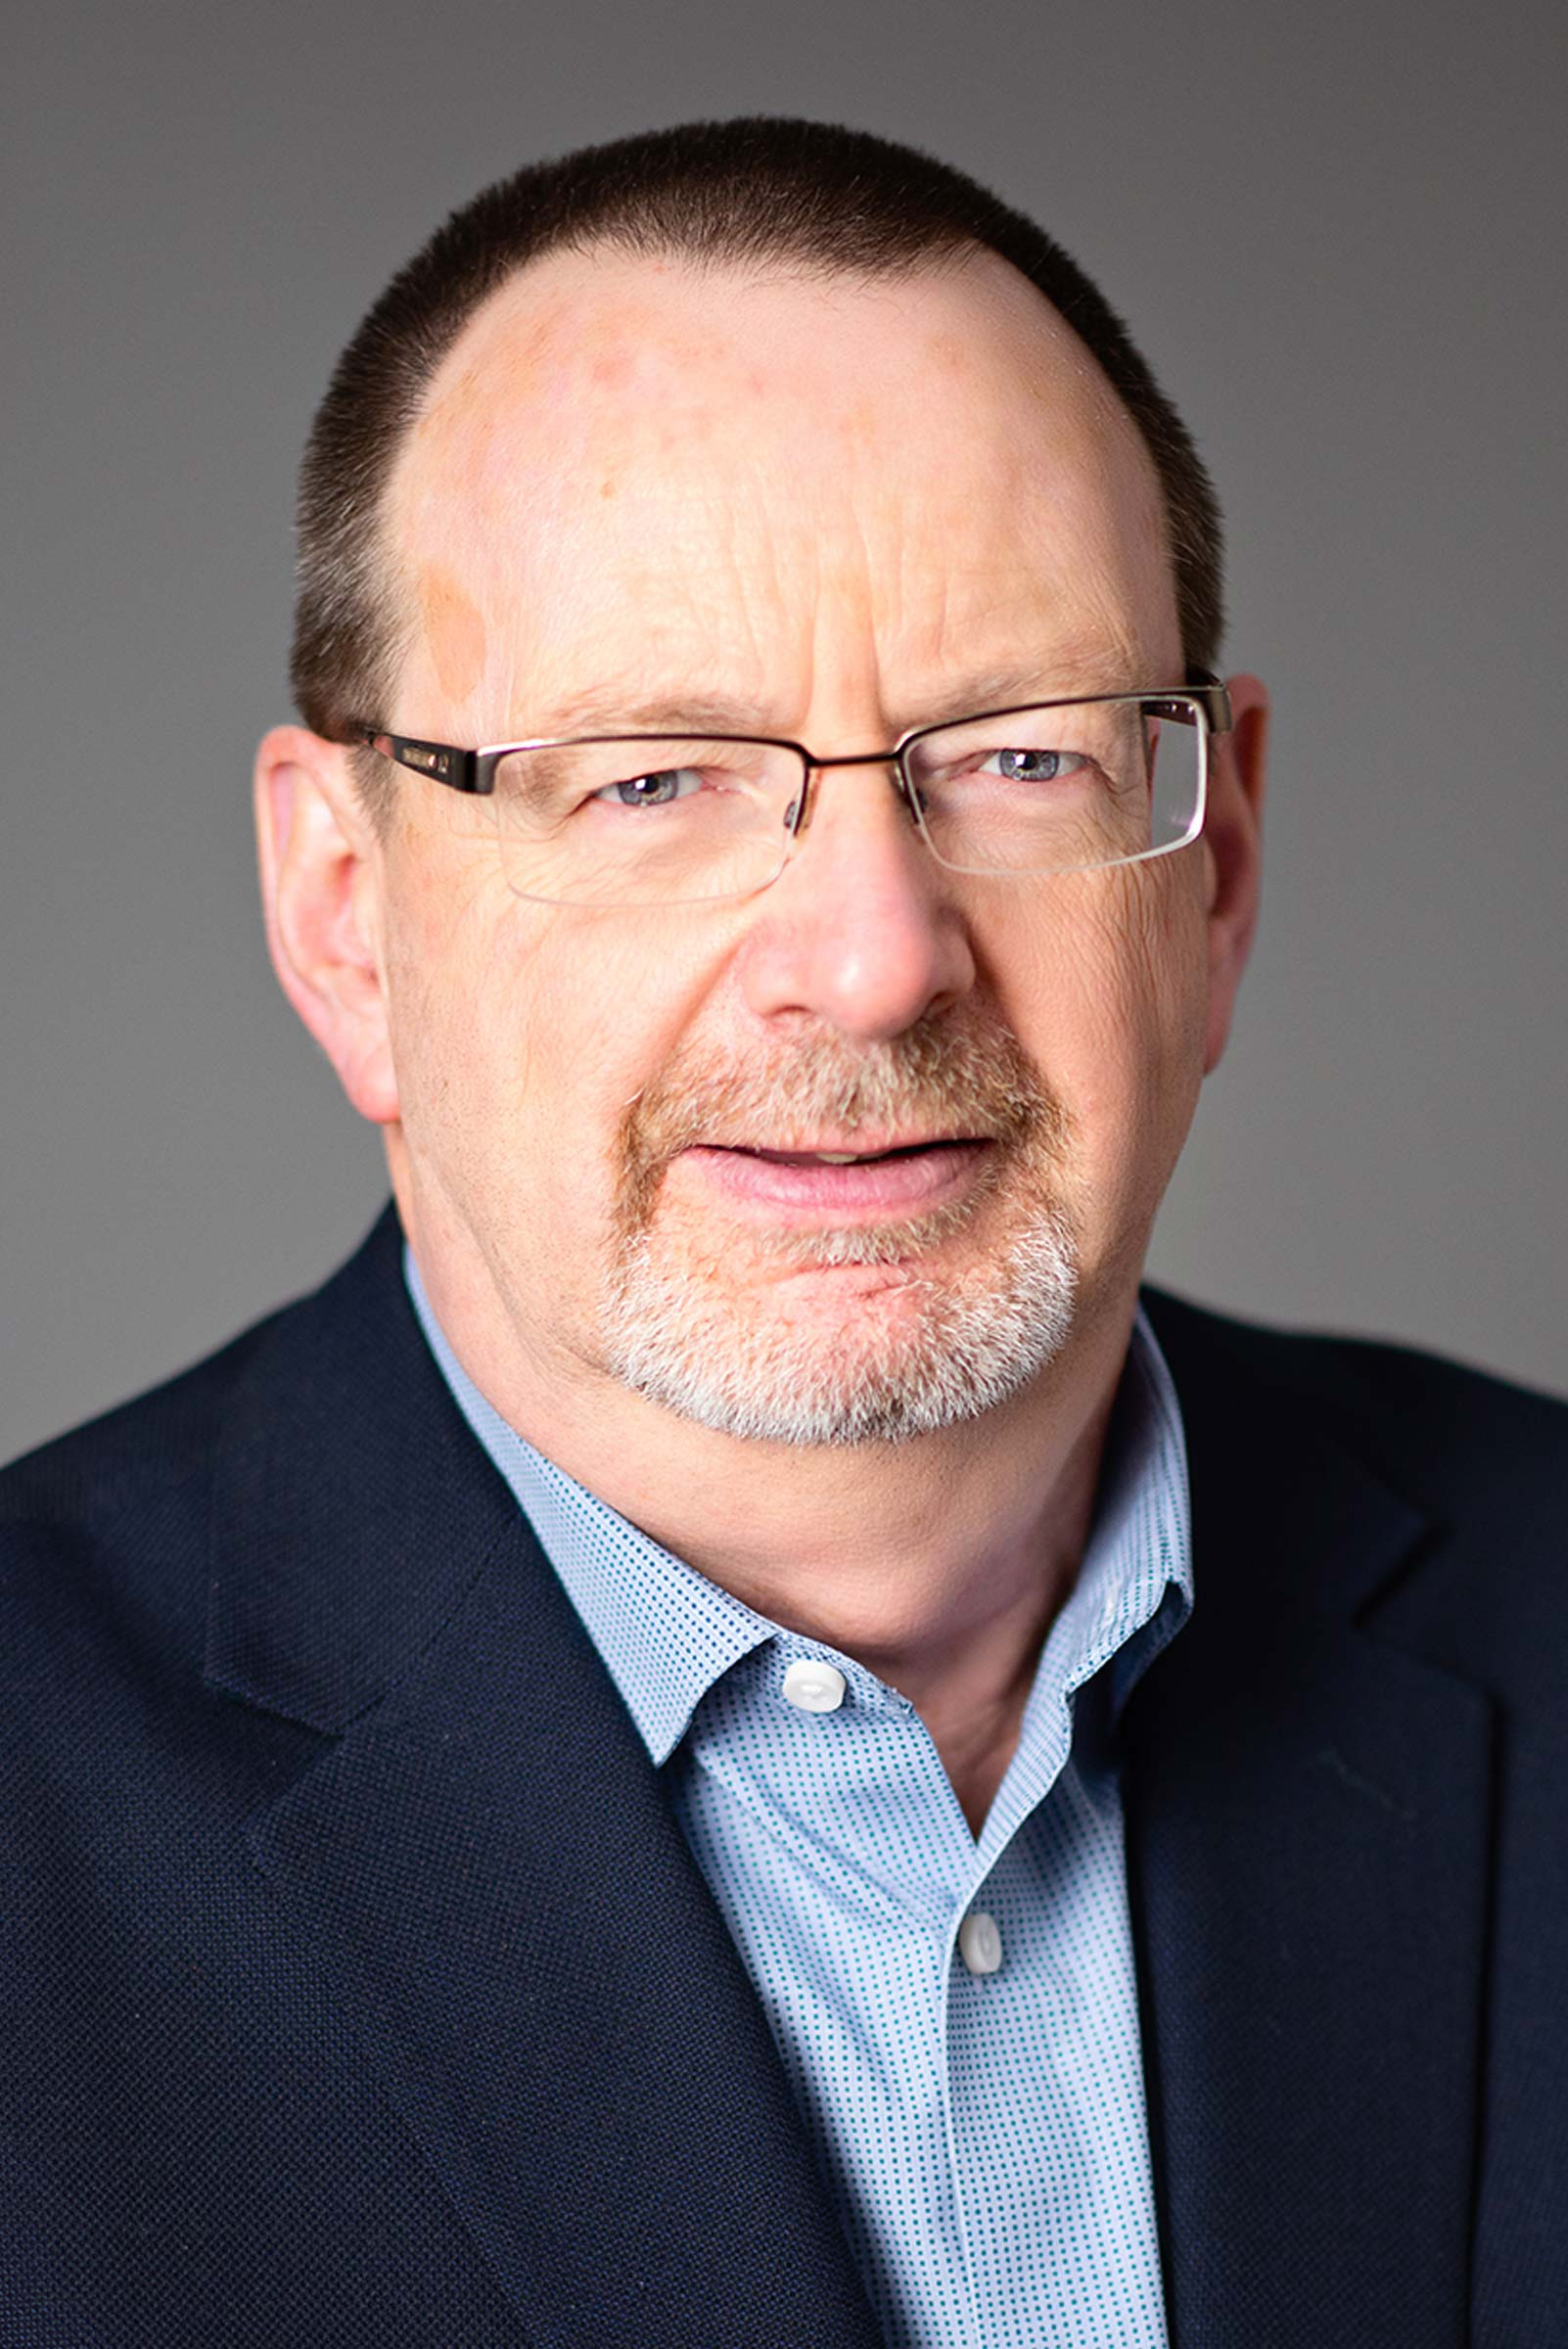 Peter Spratt